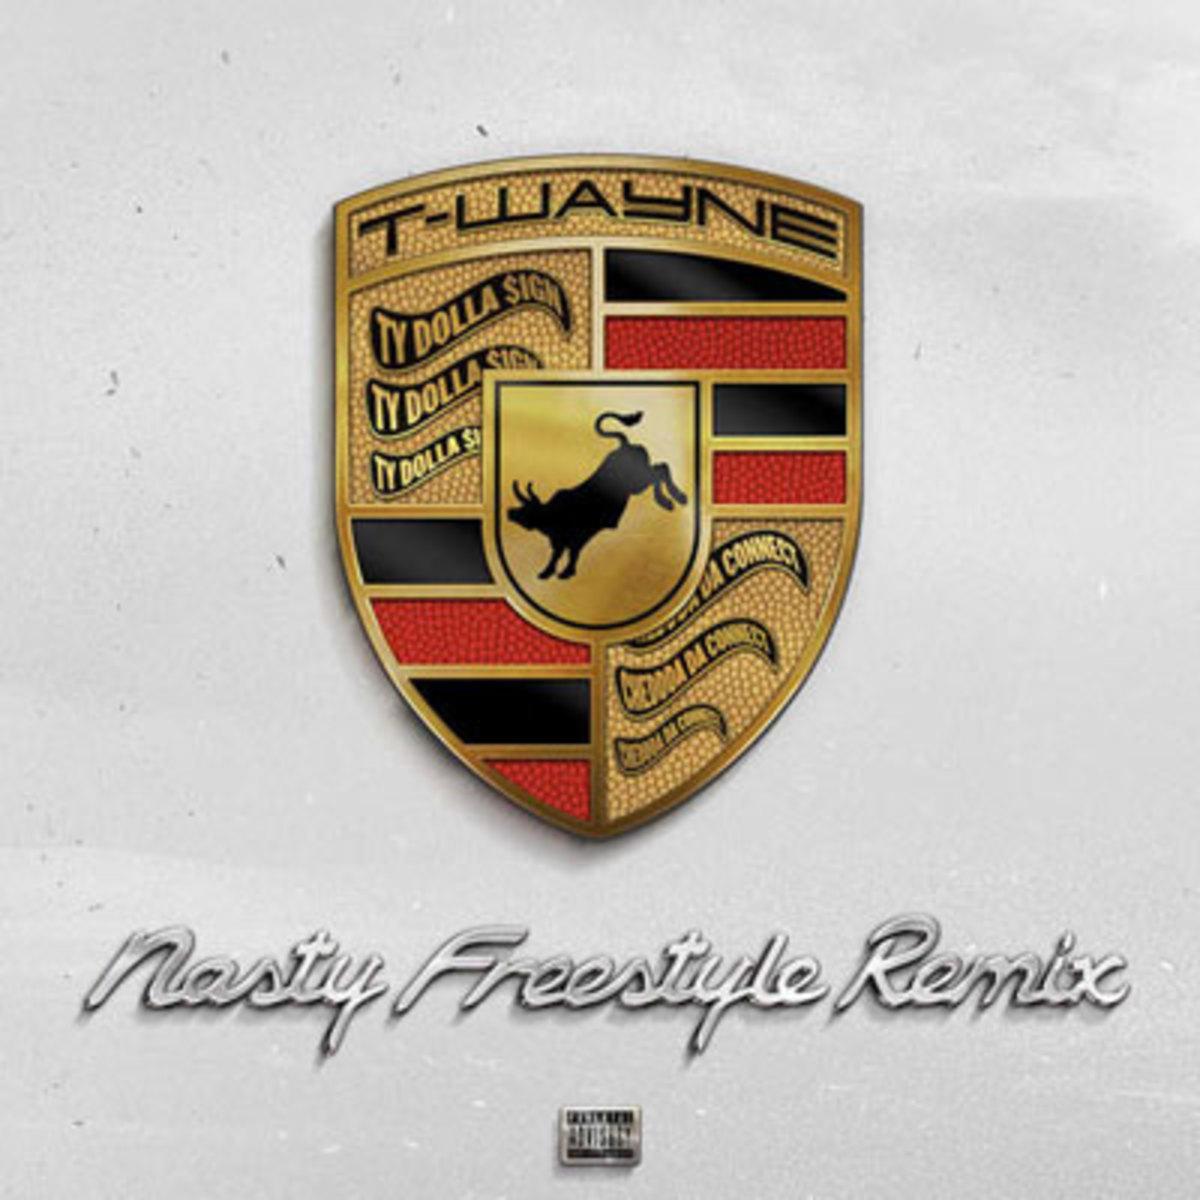 t-wayne-nasty-freestyle-remix.jpg